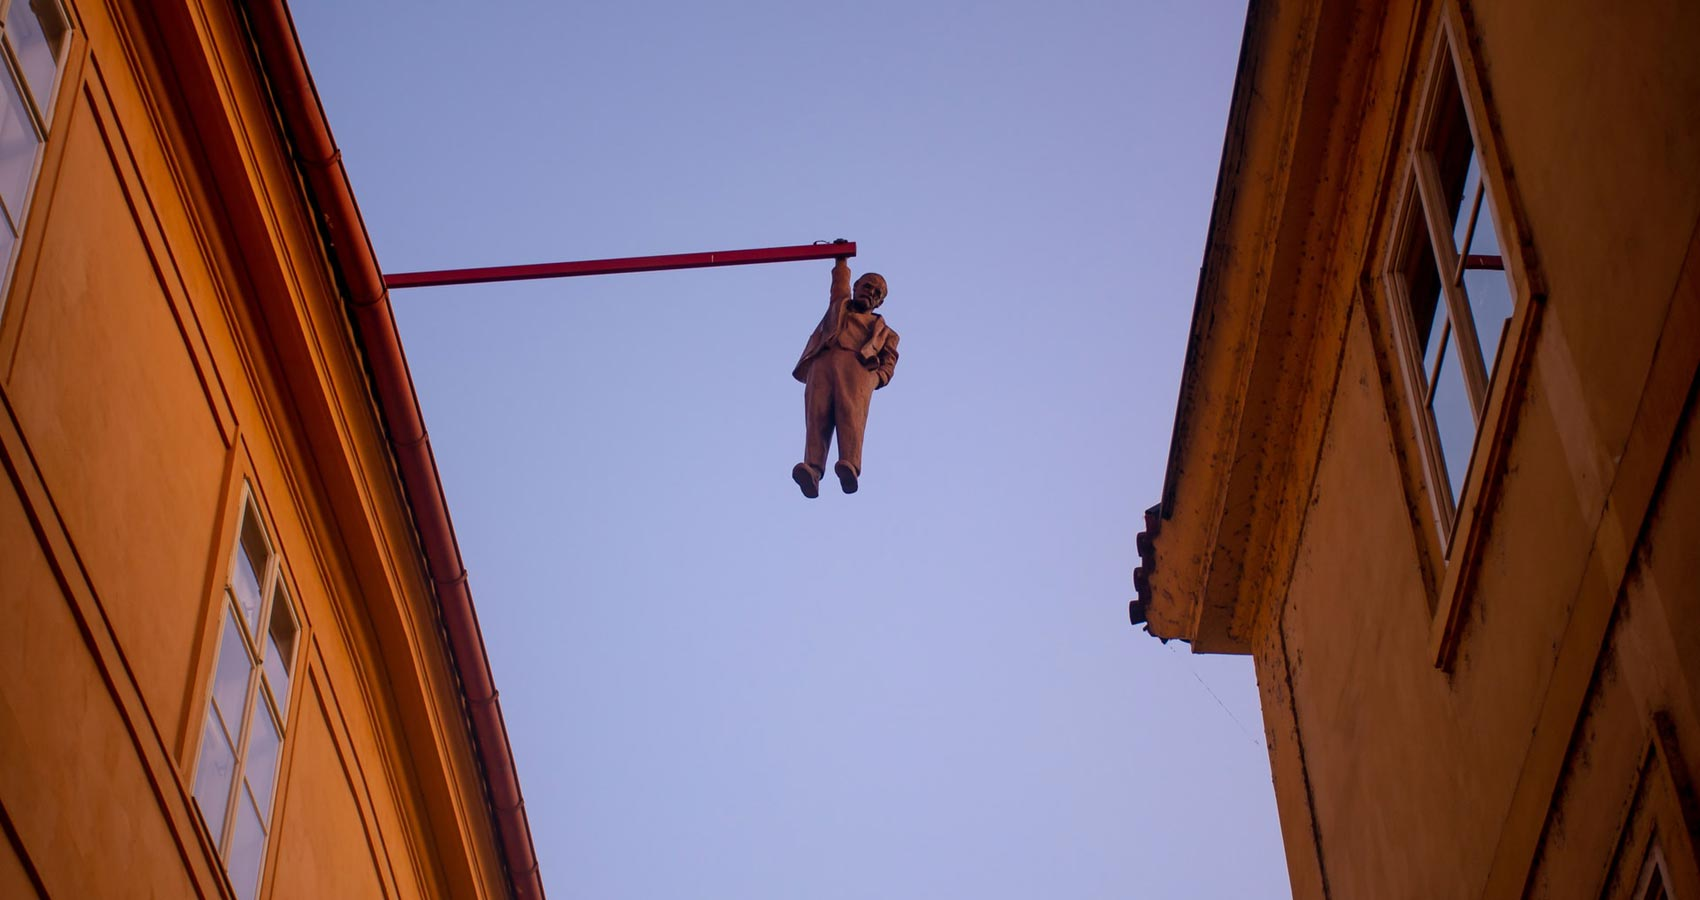 Hang The Hangman, a poem by Ikechukwu Obiorah at Spilwords.com